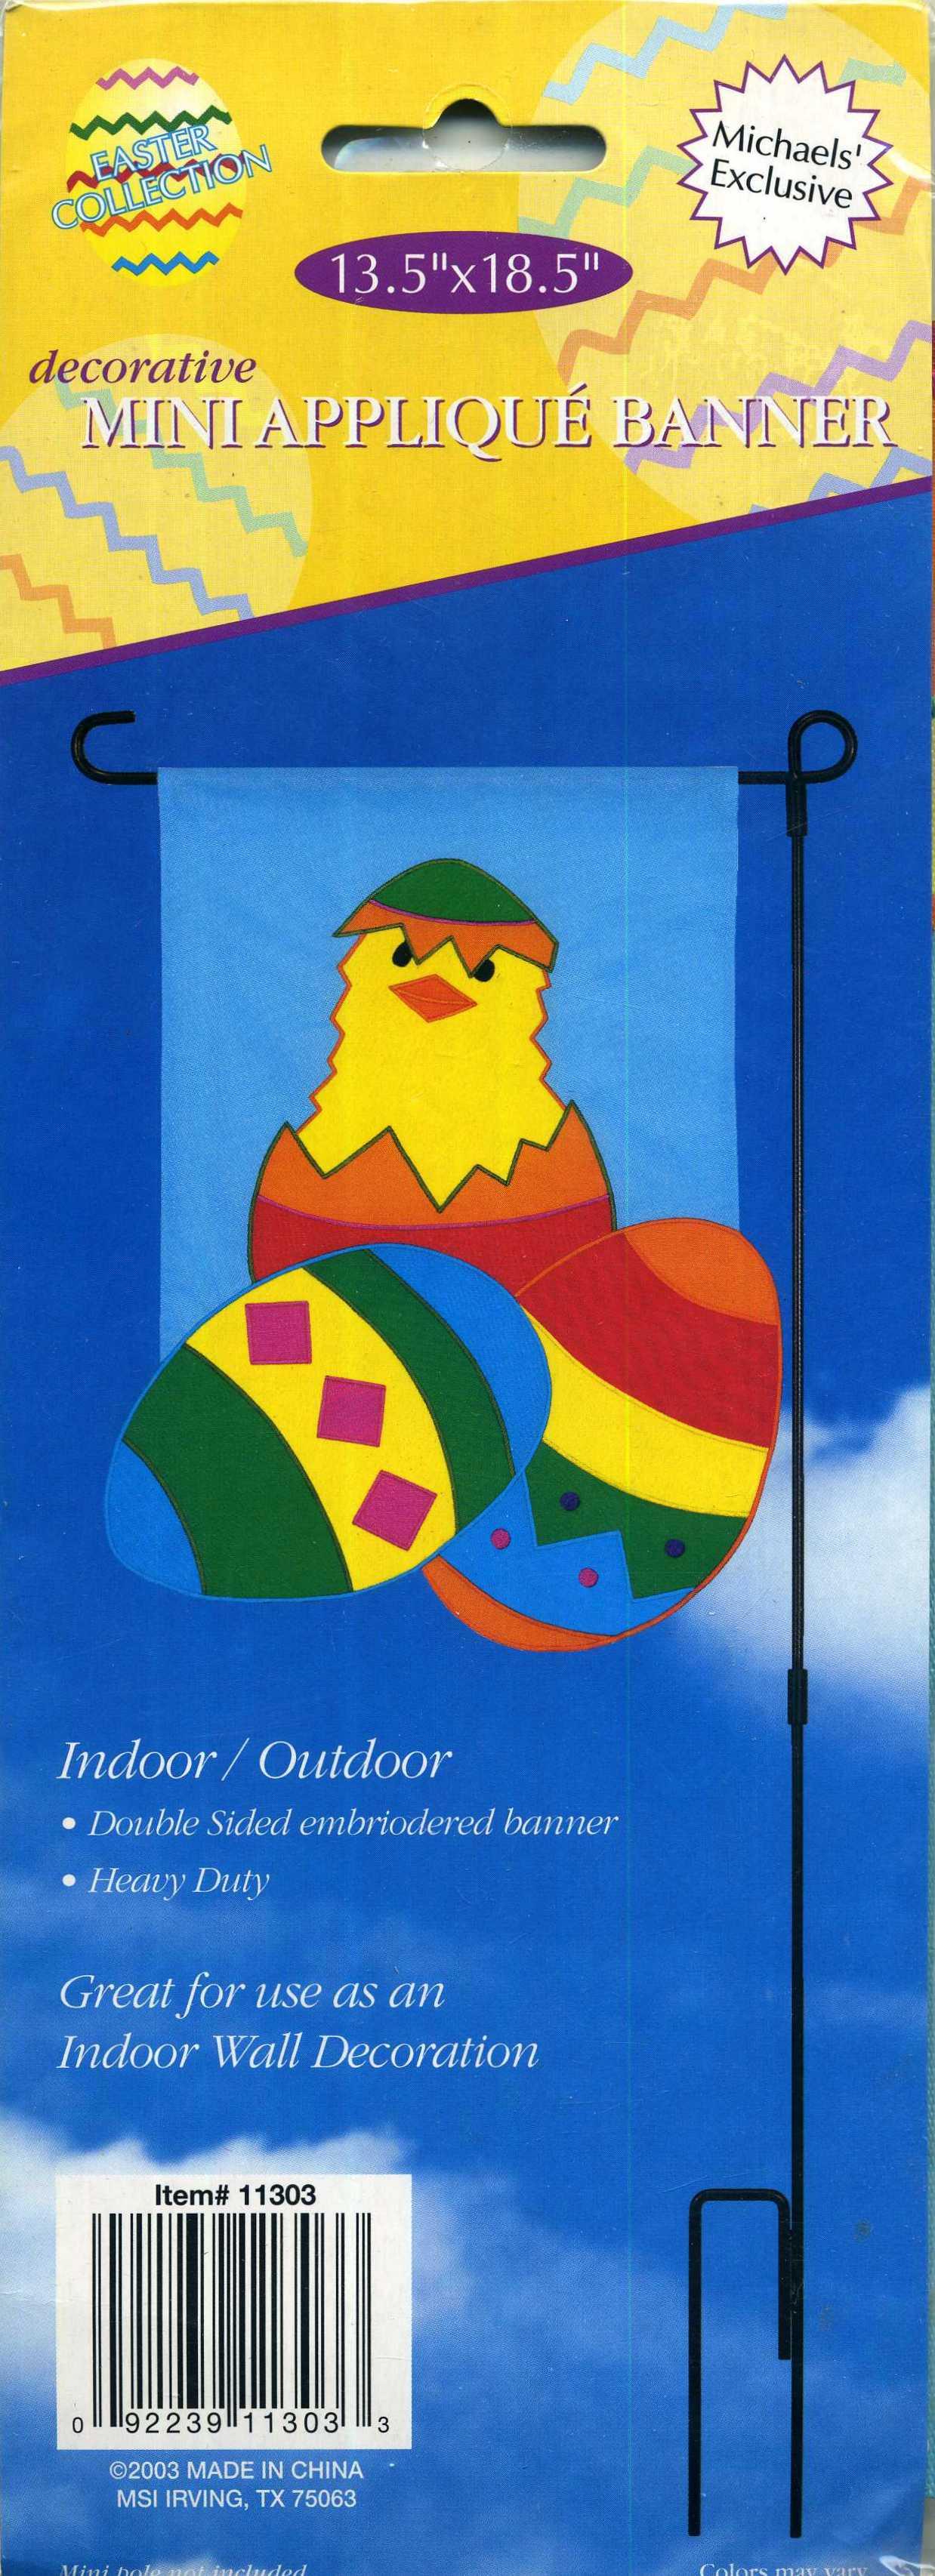 Michaels' Exclusive Easter Collection Indoor Outdoor Mini Applique Banner